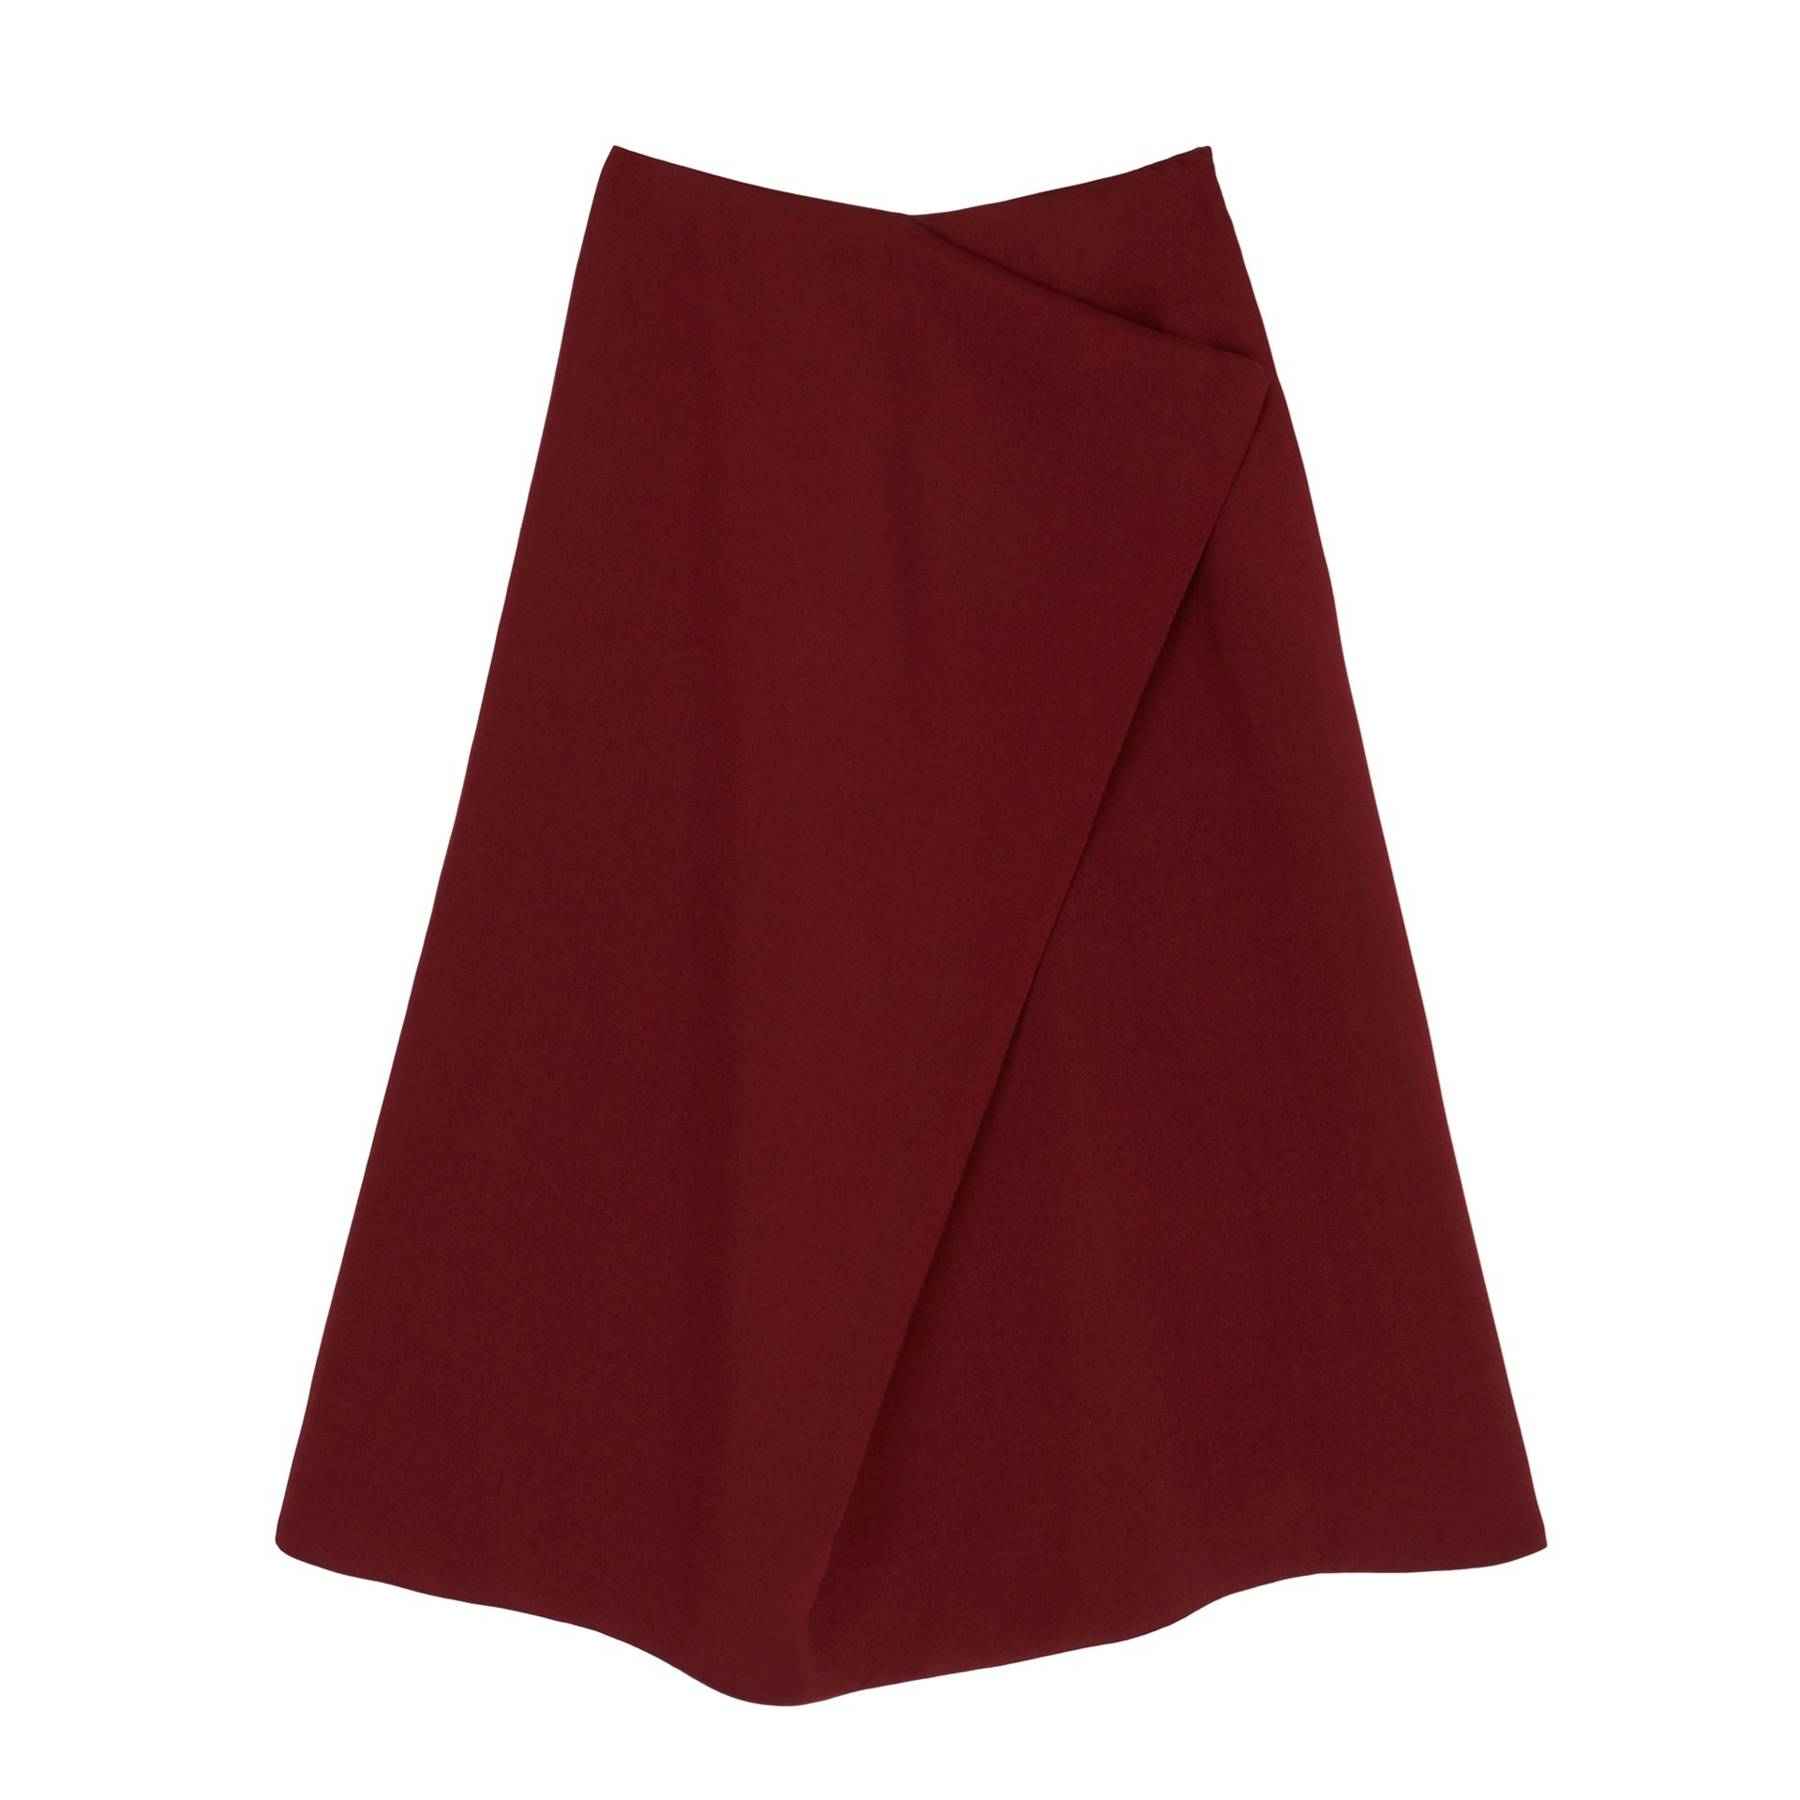 Tall Girls Shopping Guide: Long Tall Sally, ASOS Tall, Next Tall | Glamour UK